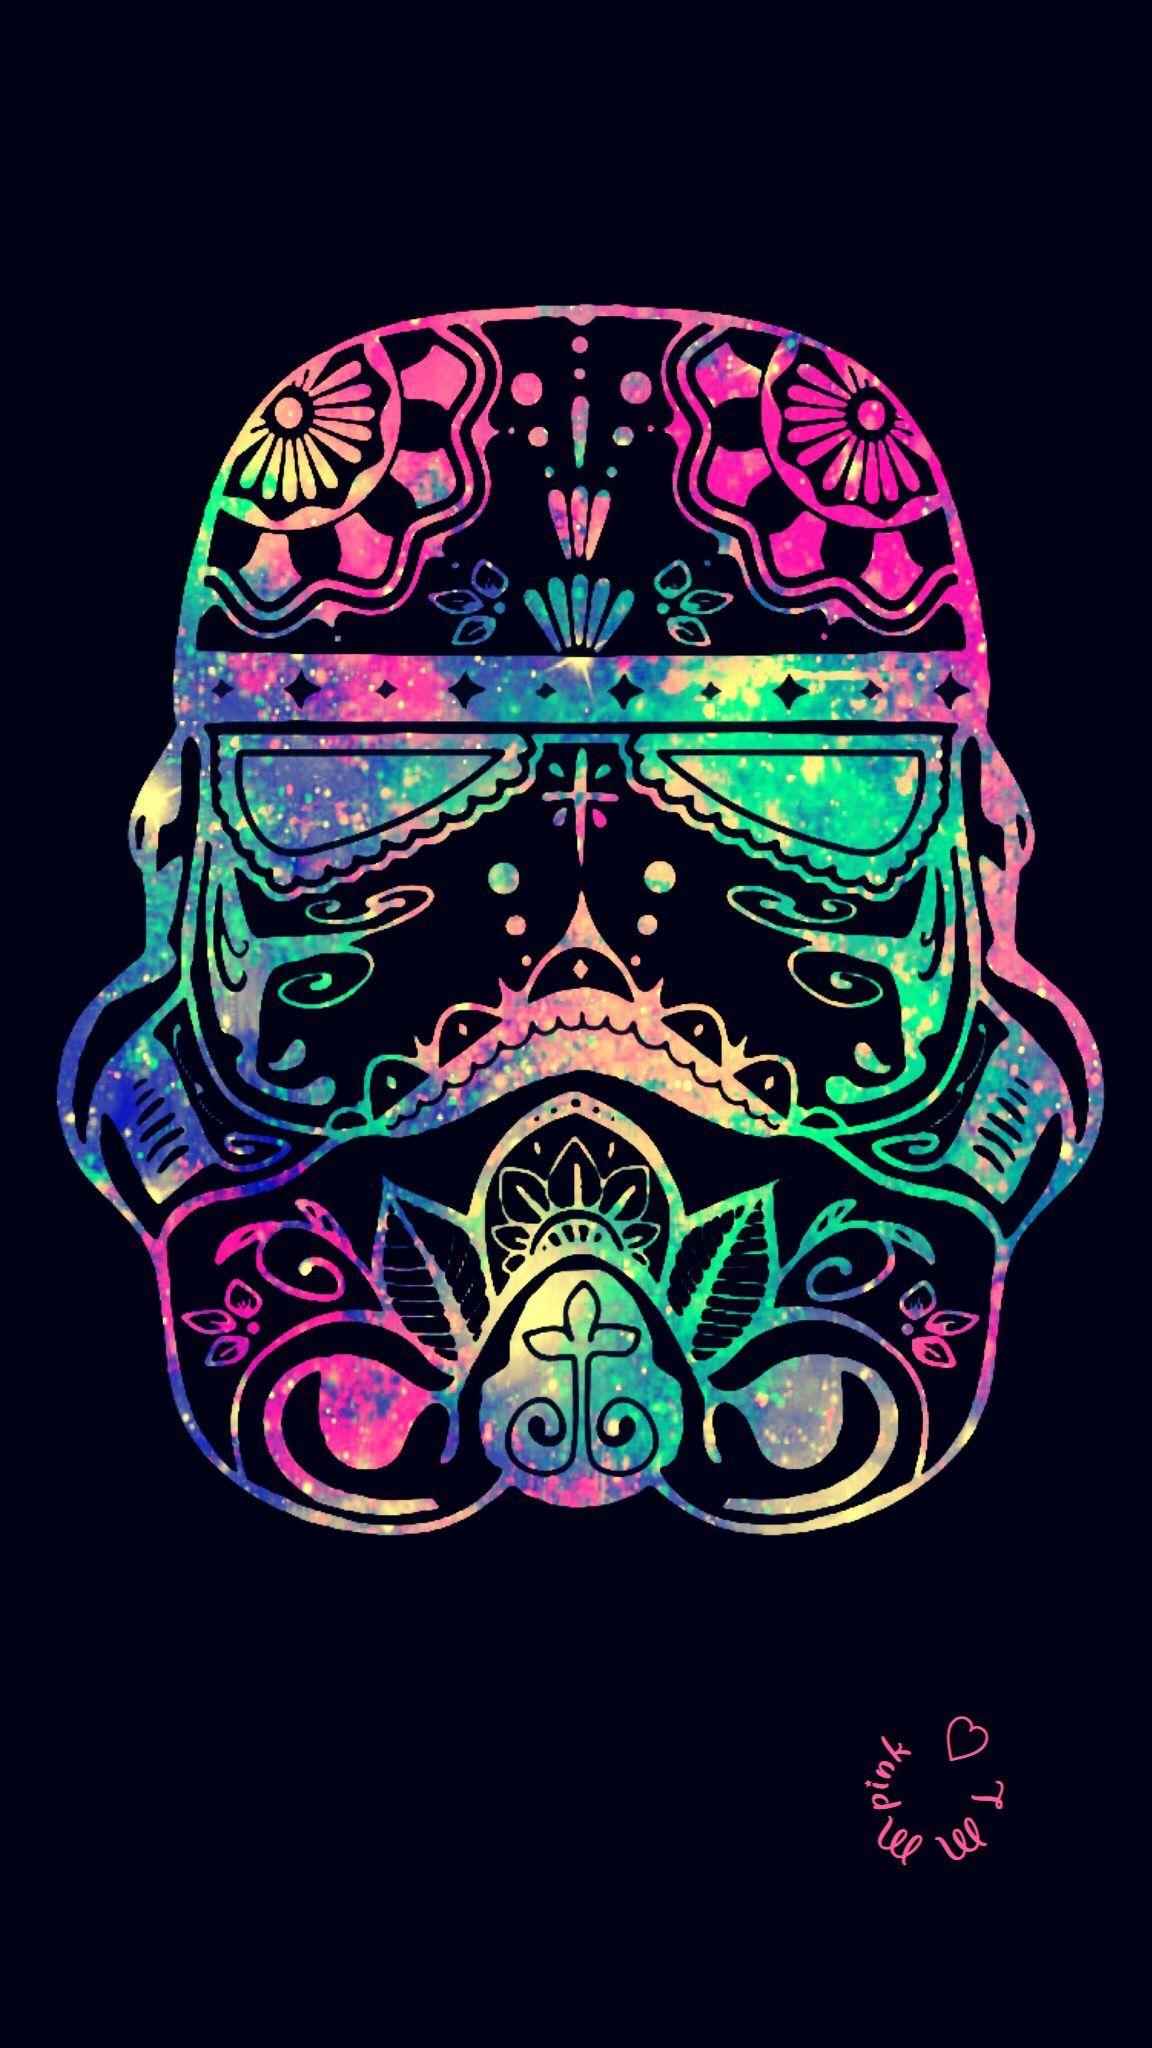 Neon Star Wars Wallpapers Wallpaper Cave